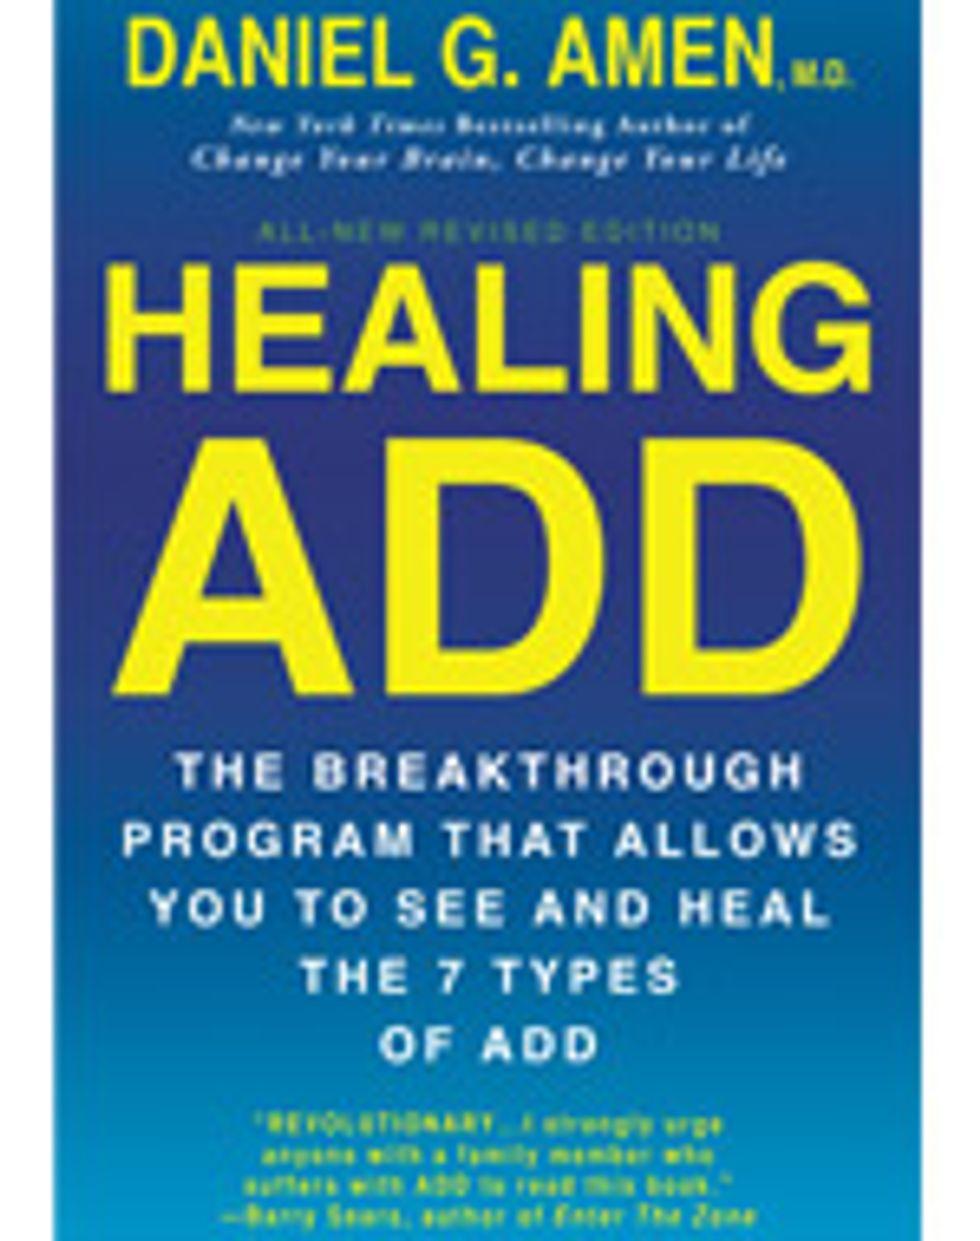 Healing ADD